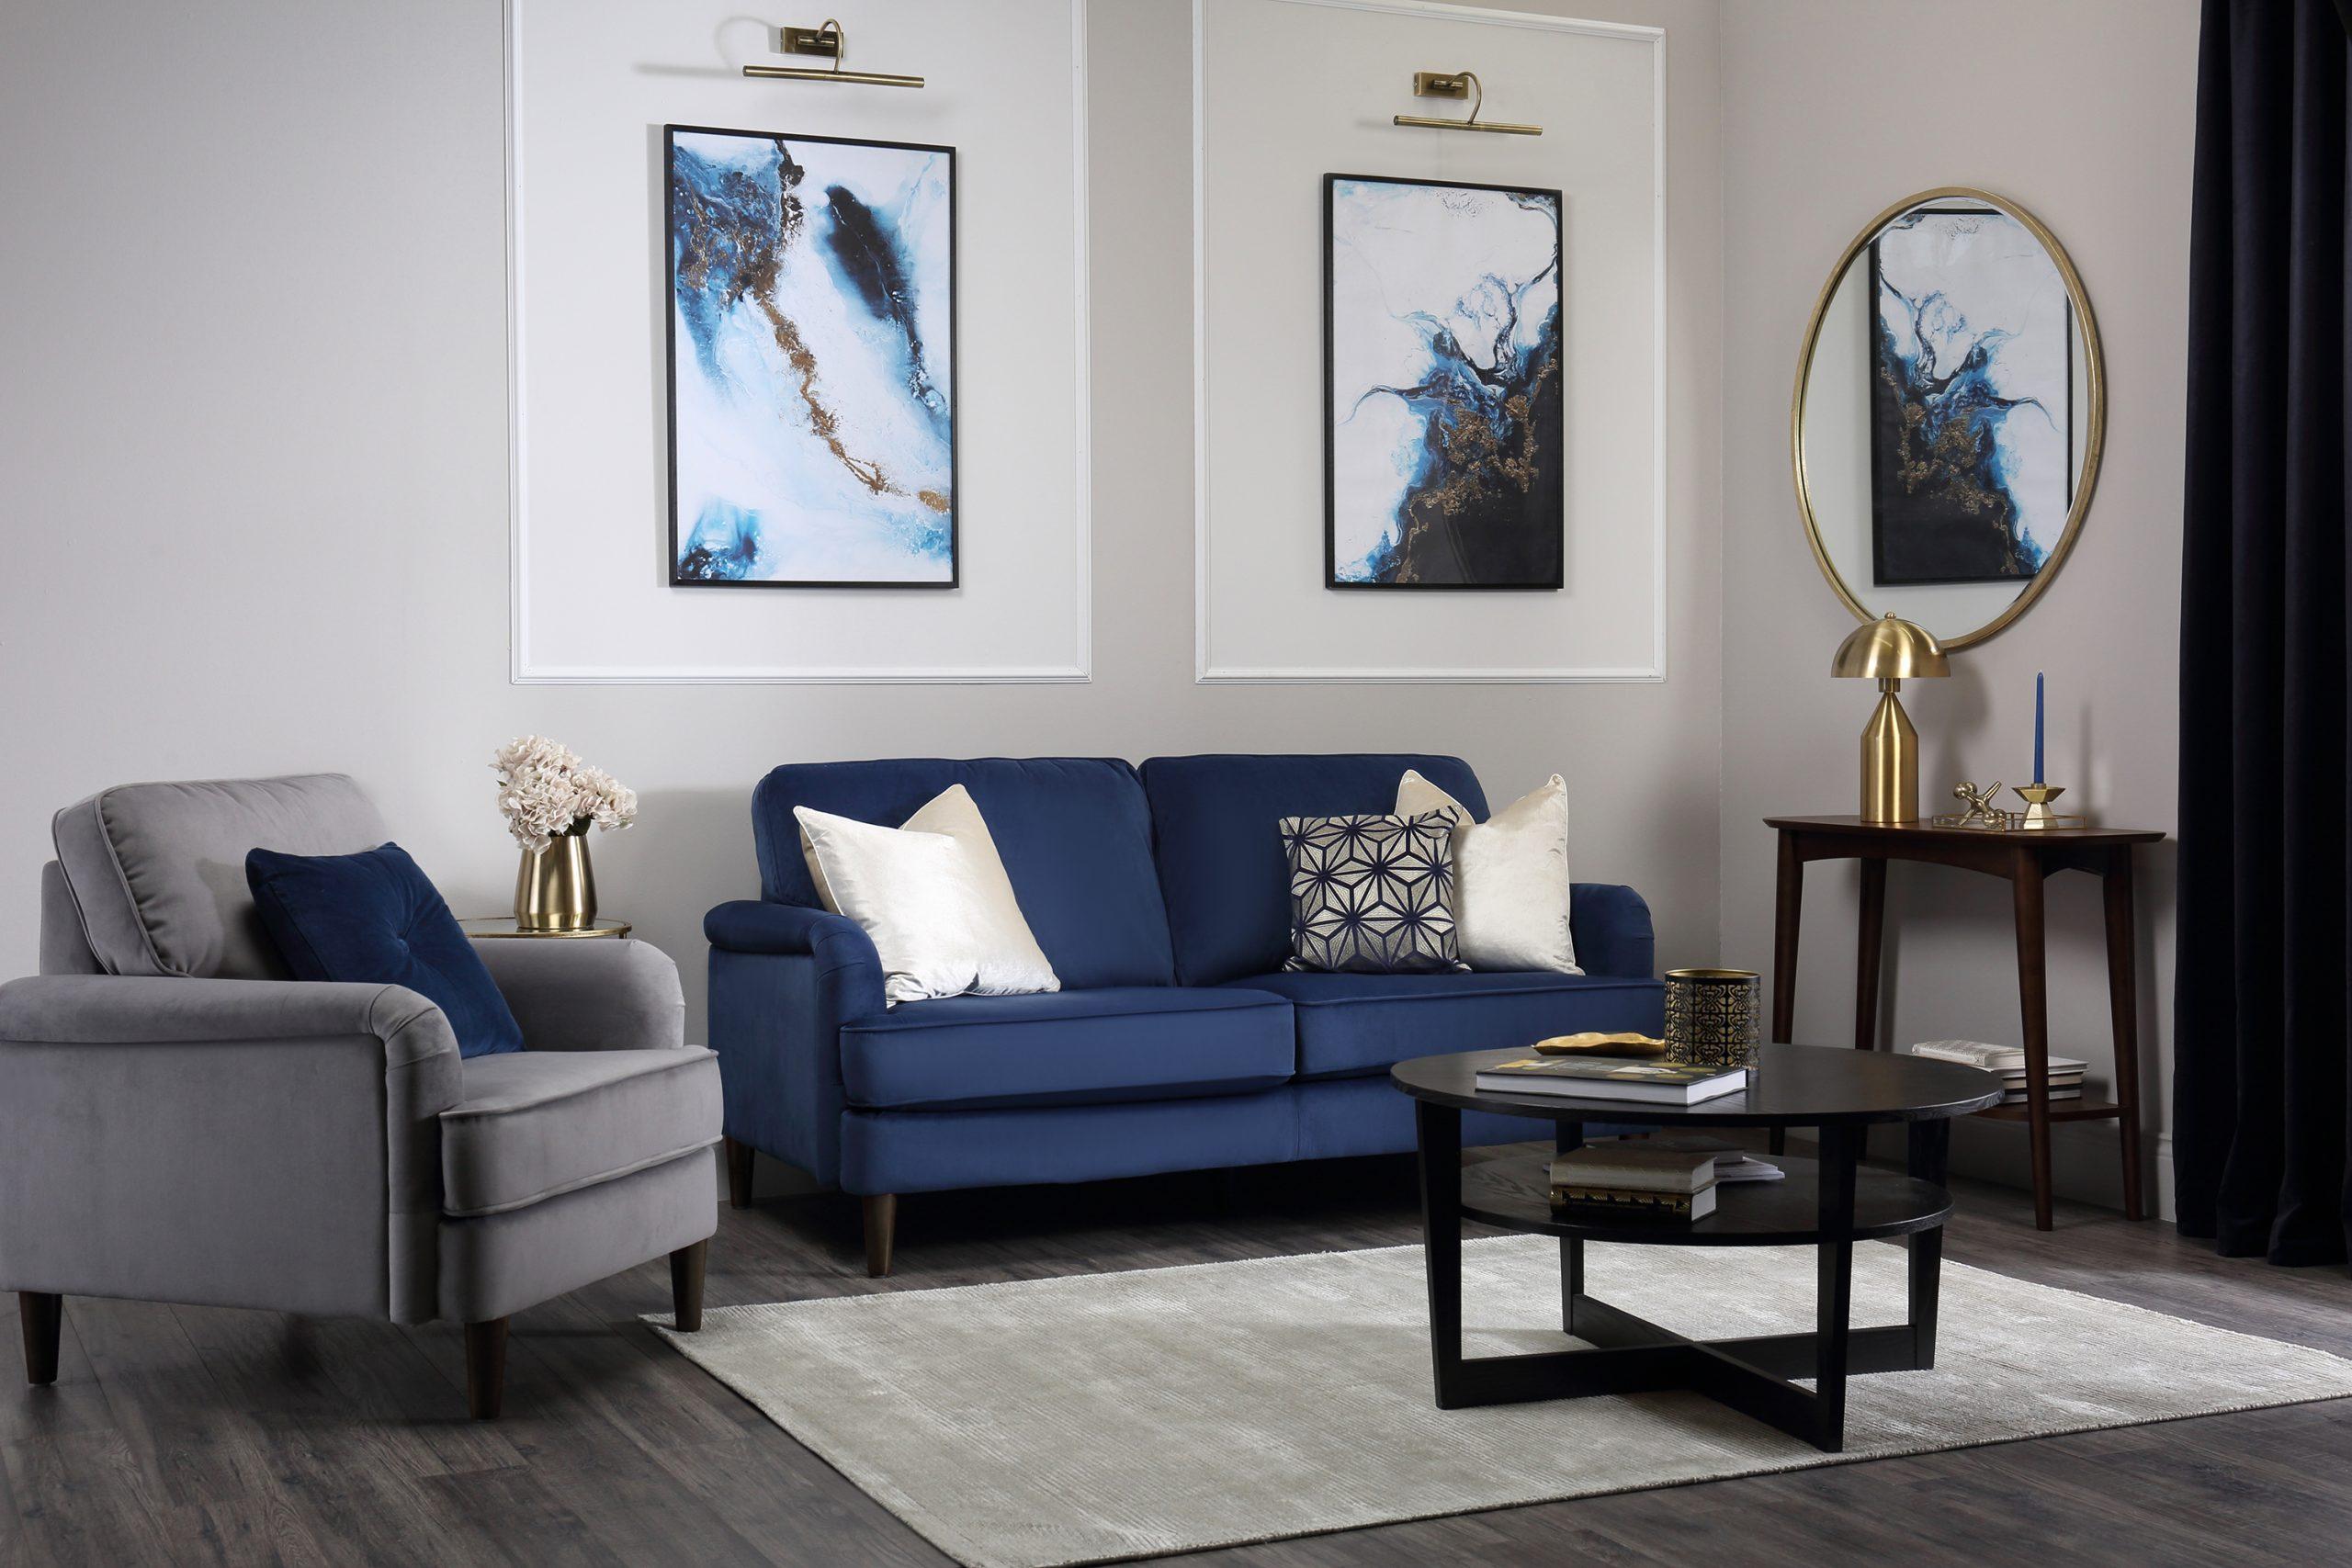 Fc Pembroke Blue Velvet 3 Seater Sofa Www.furniturechoice.co.uk